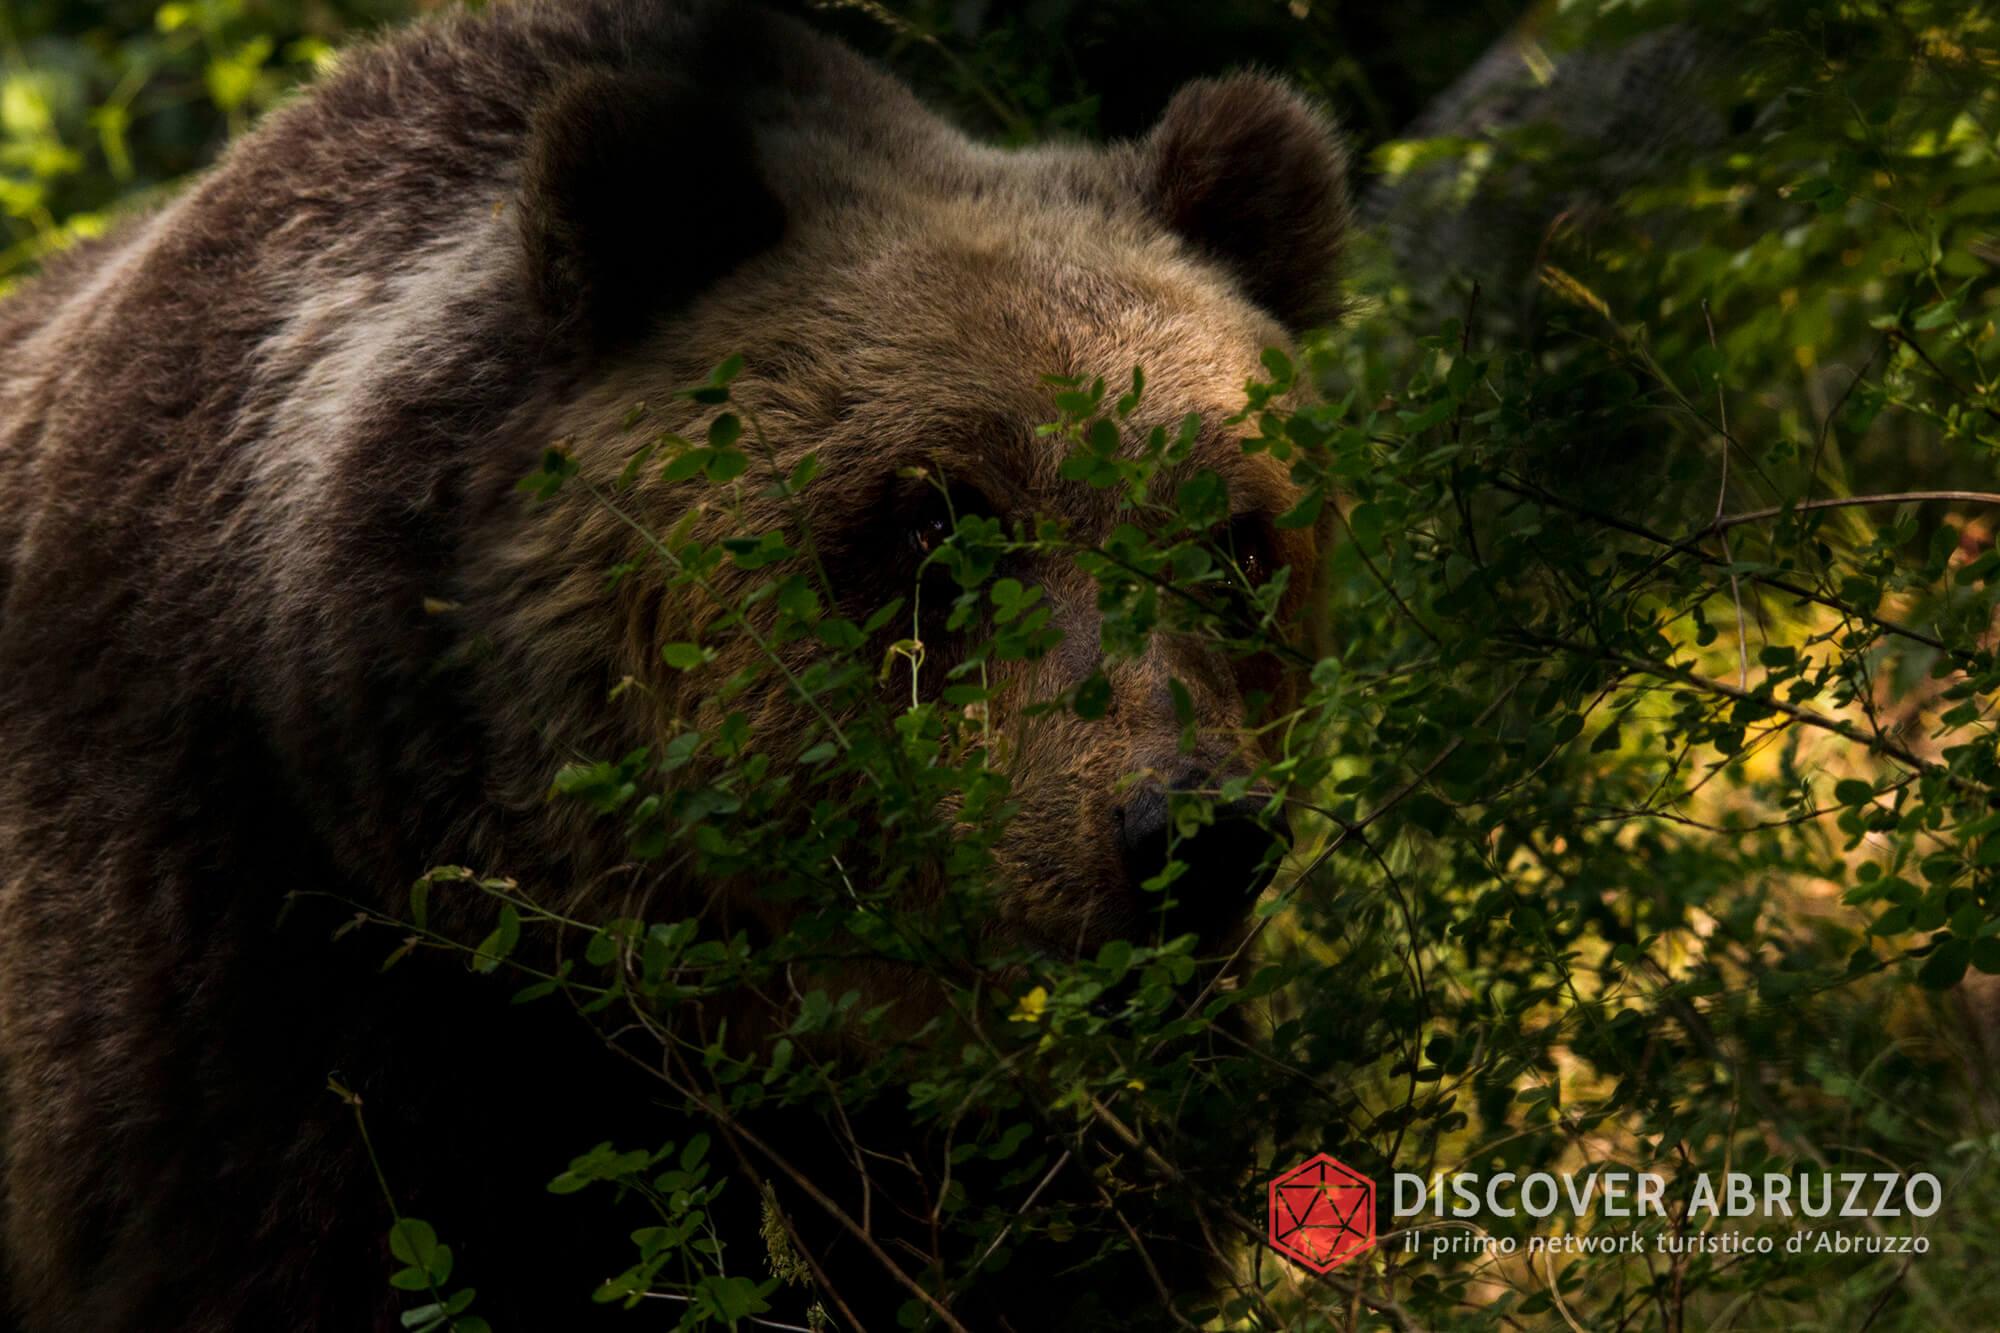 Wildlife Orsomarsicano Discover Abruzzo Nature Ours